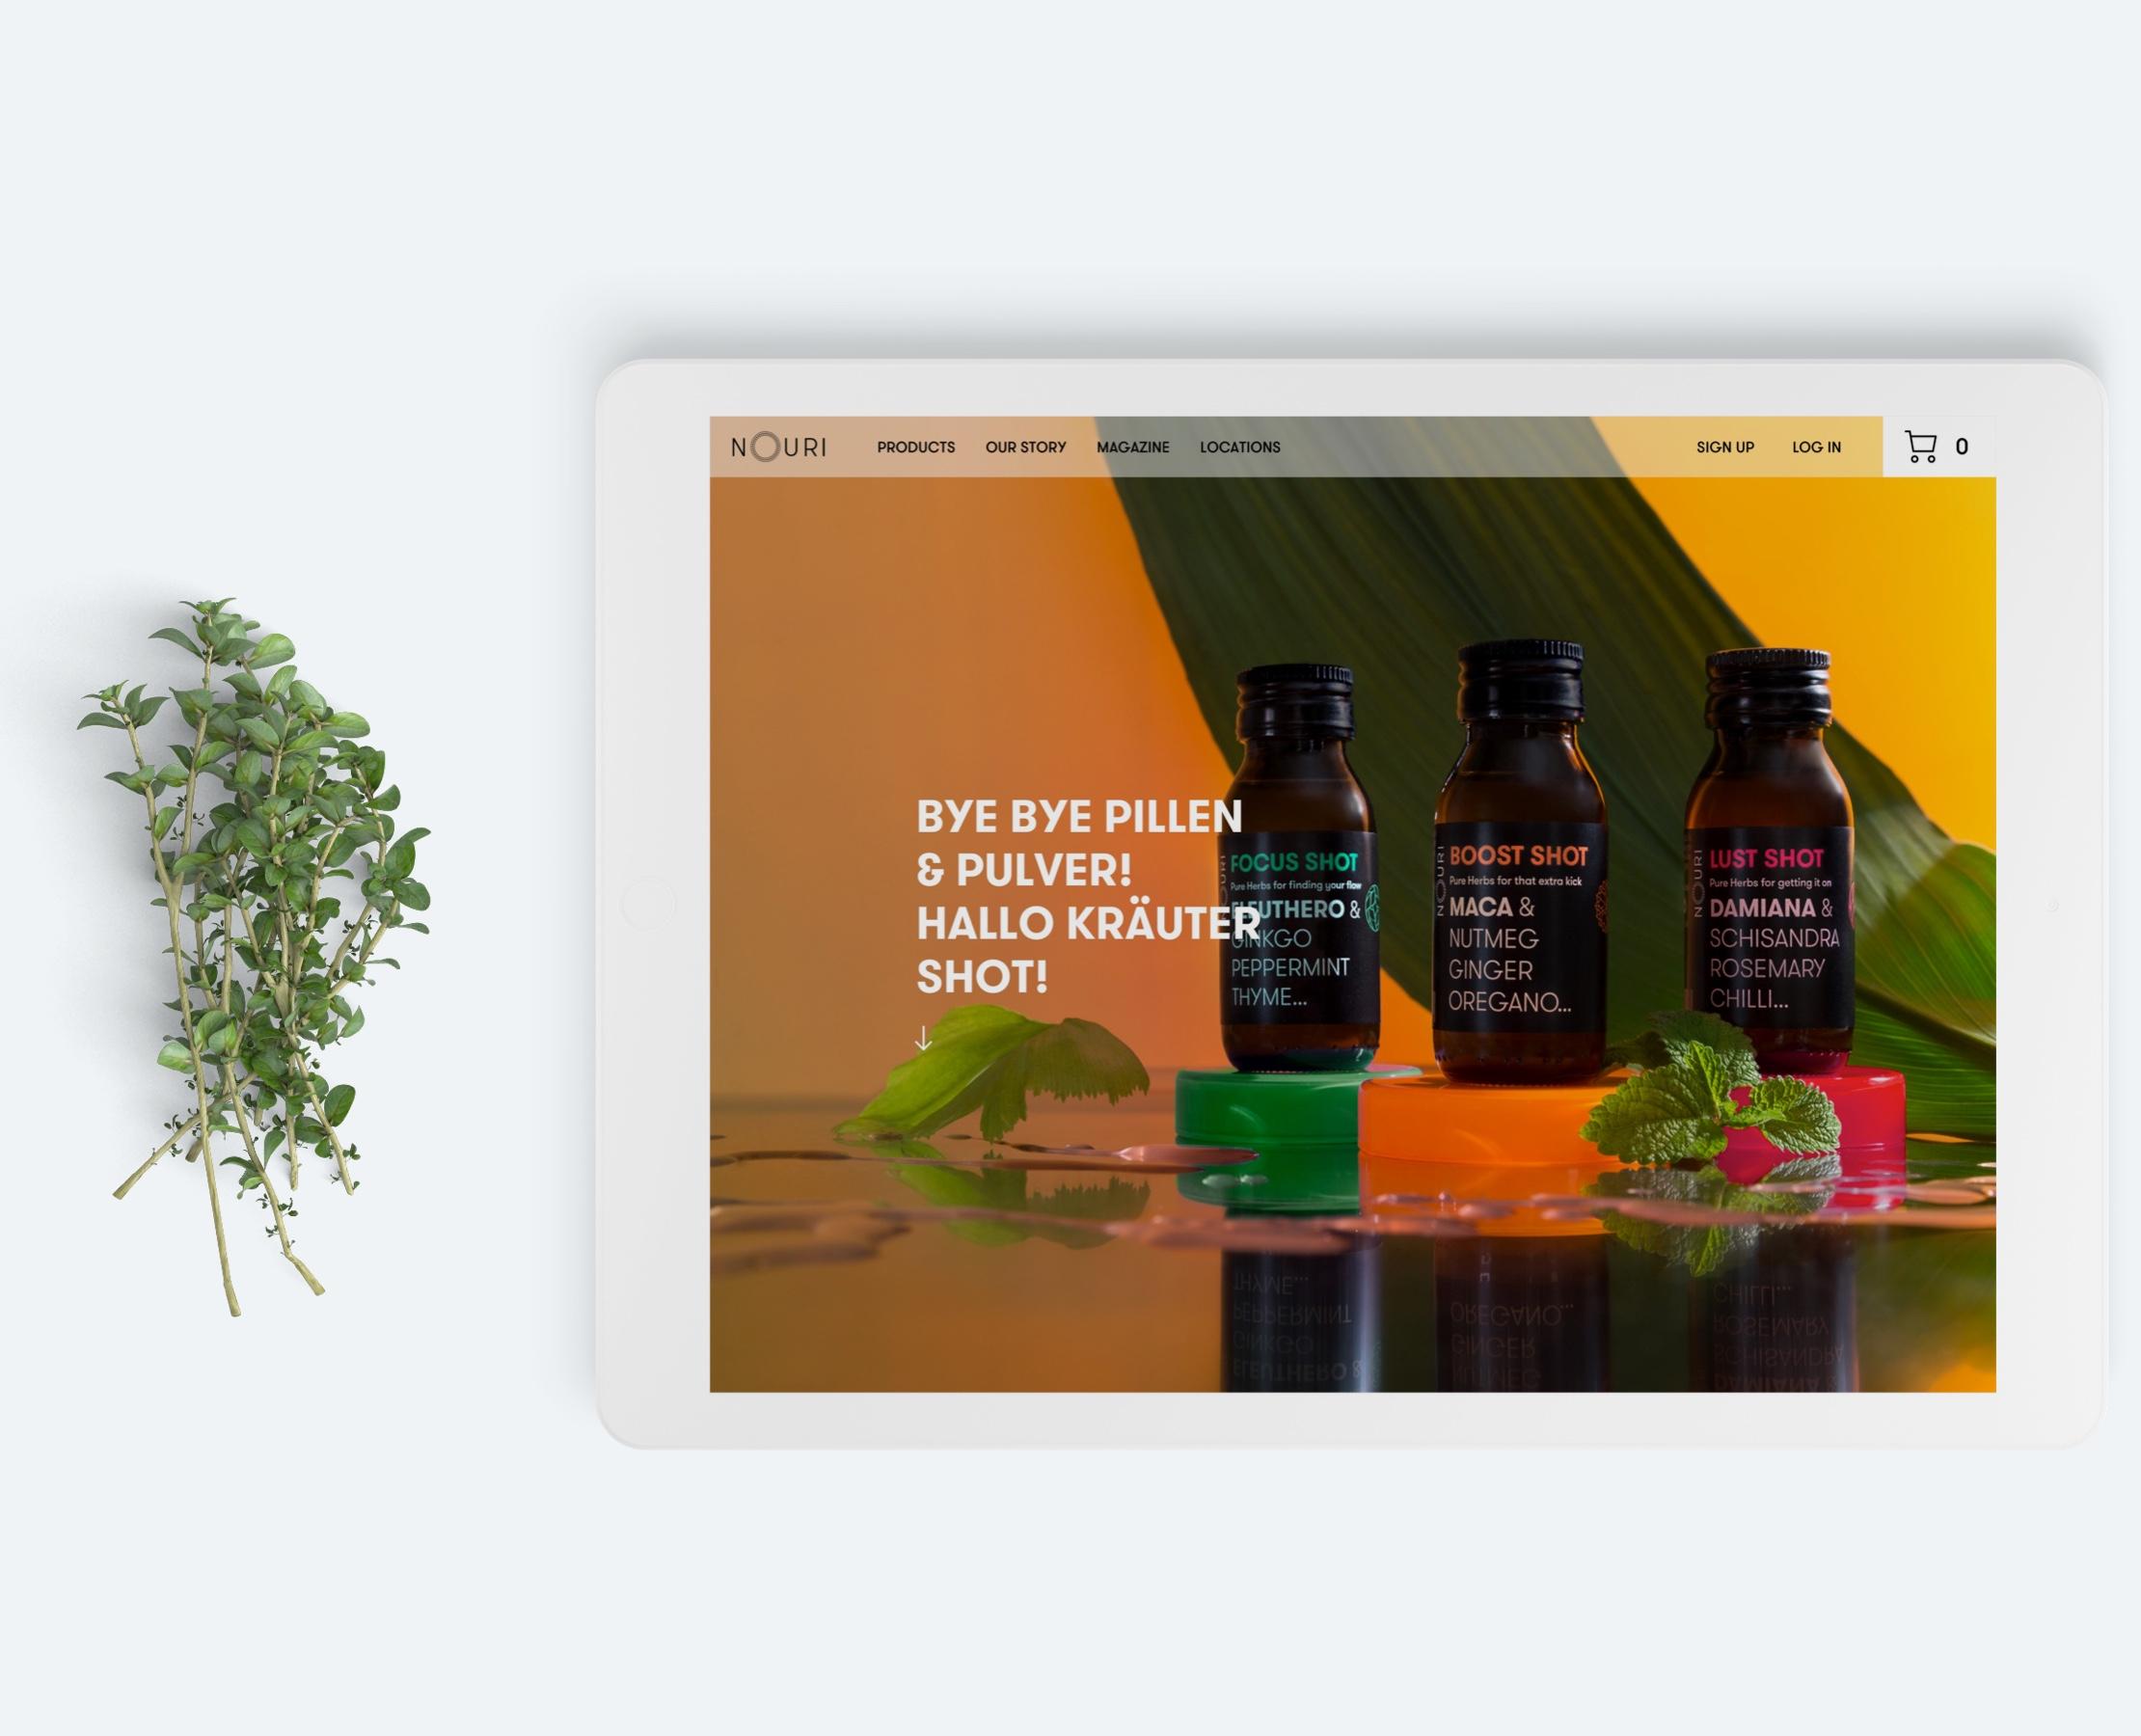 mynouri.com design by Manu Franco-UX designer